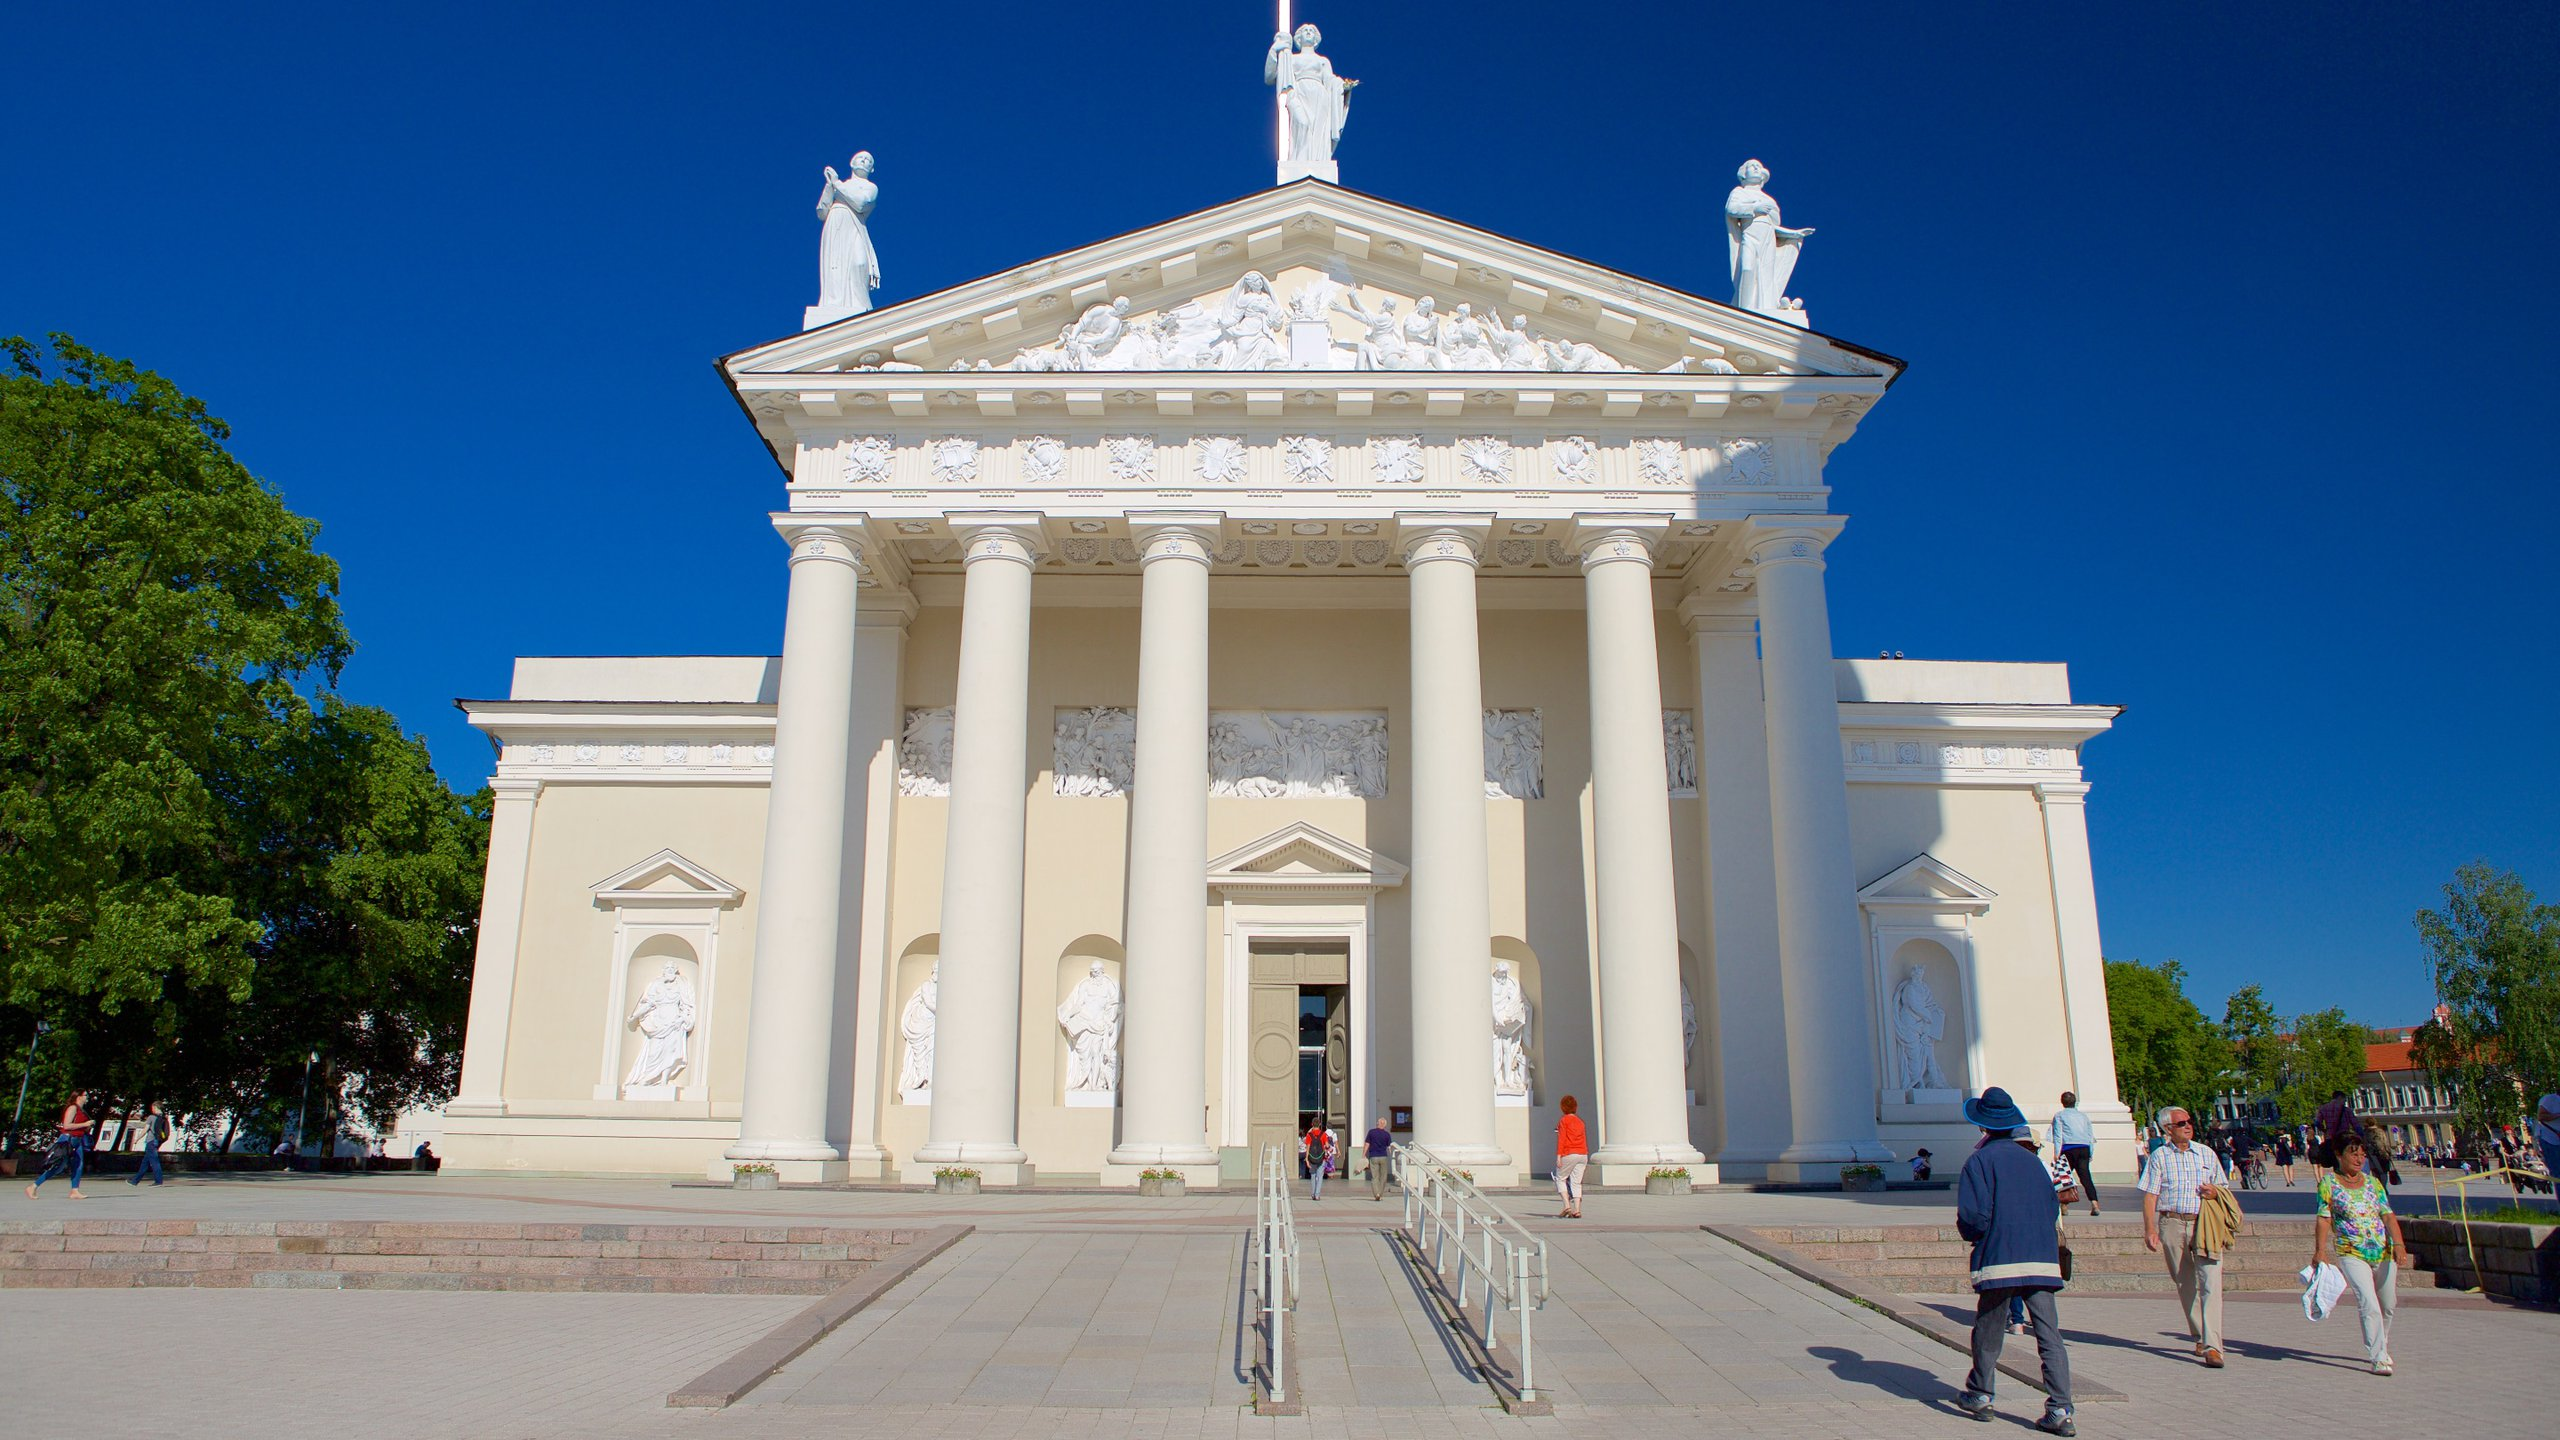 Vilnius, Vilnius County, Lithuania